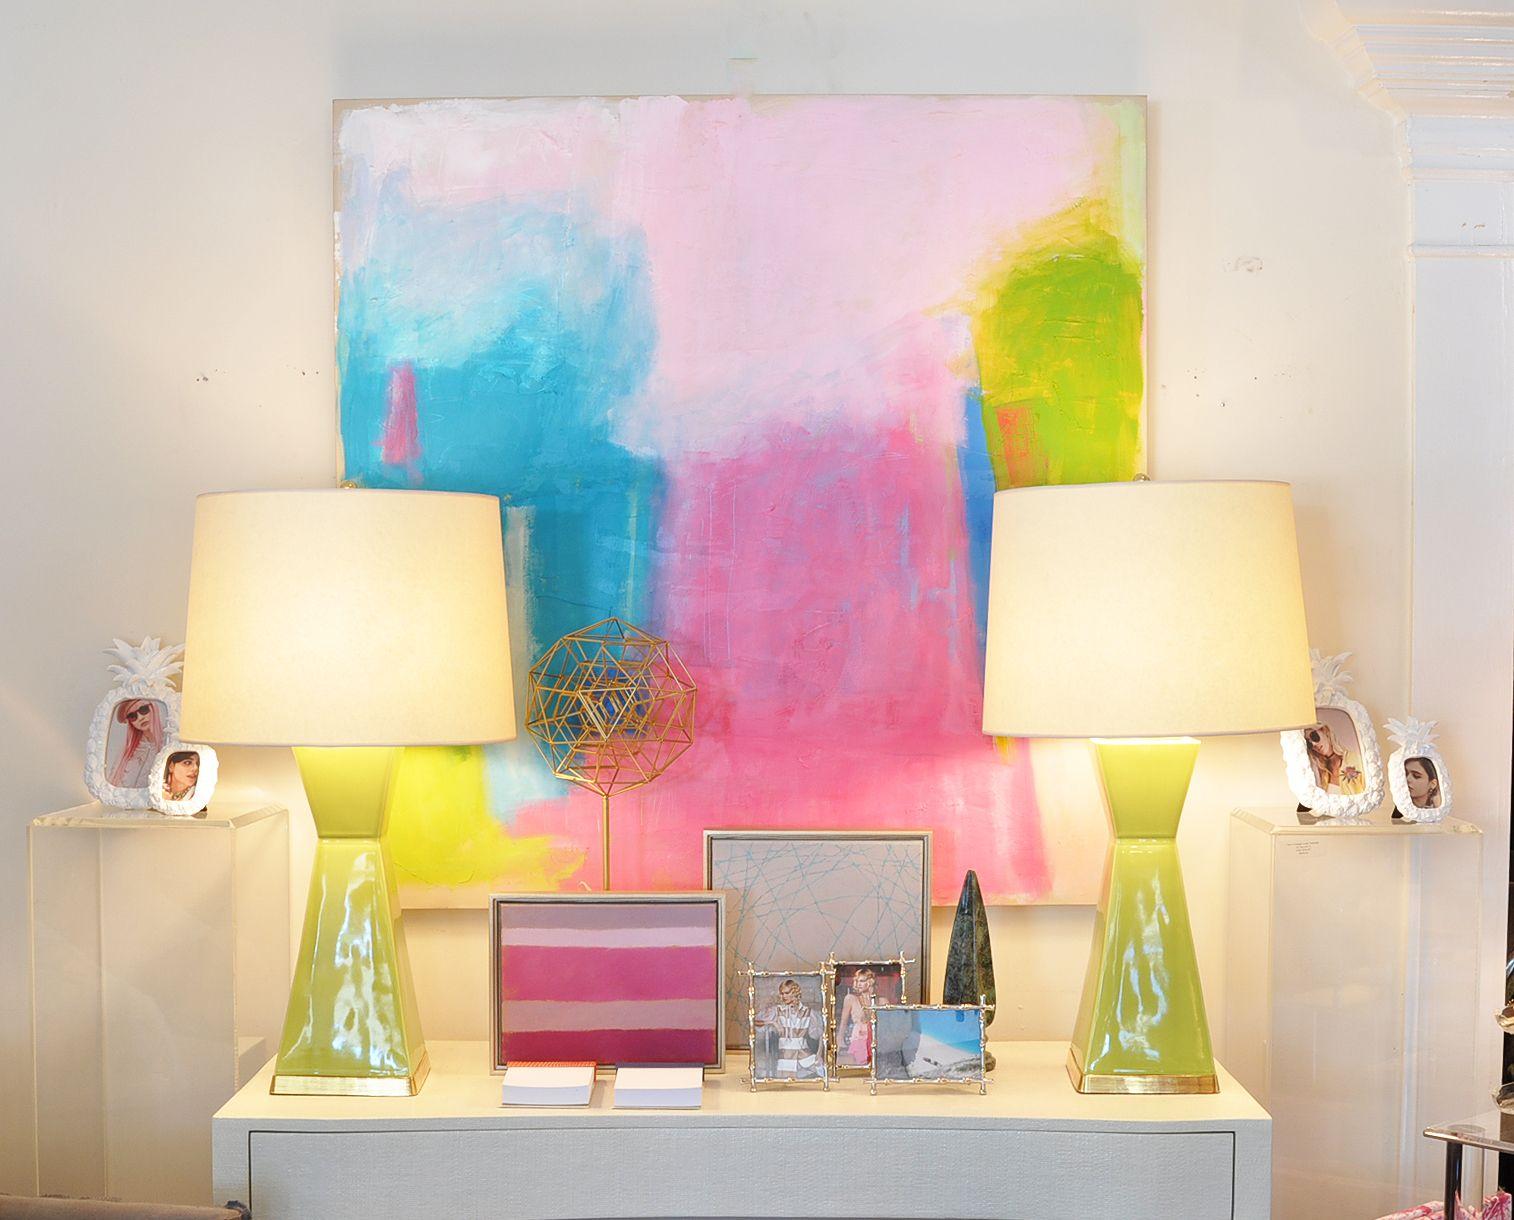 Springtime Leslie Milsten pastels at Mecox Palm Beach #interiordesign #home #decor #design #lighting #MecoxGardens